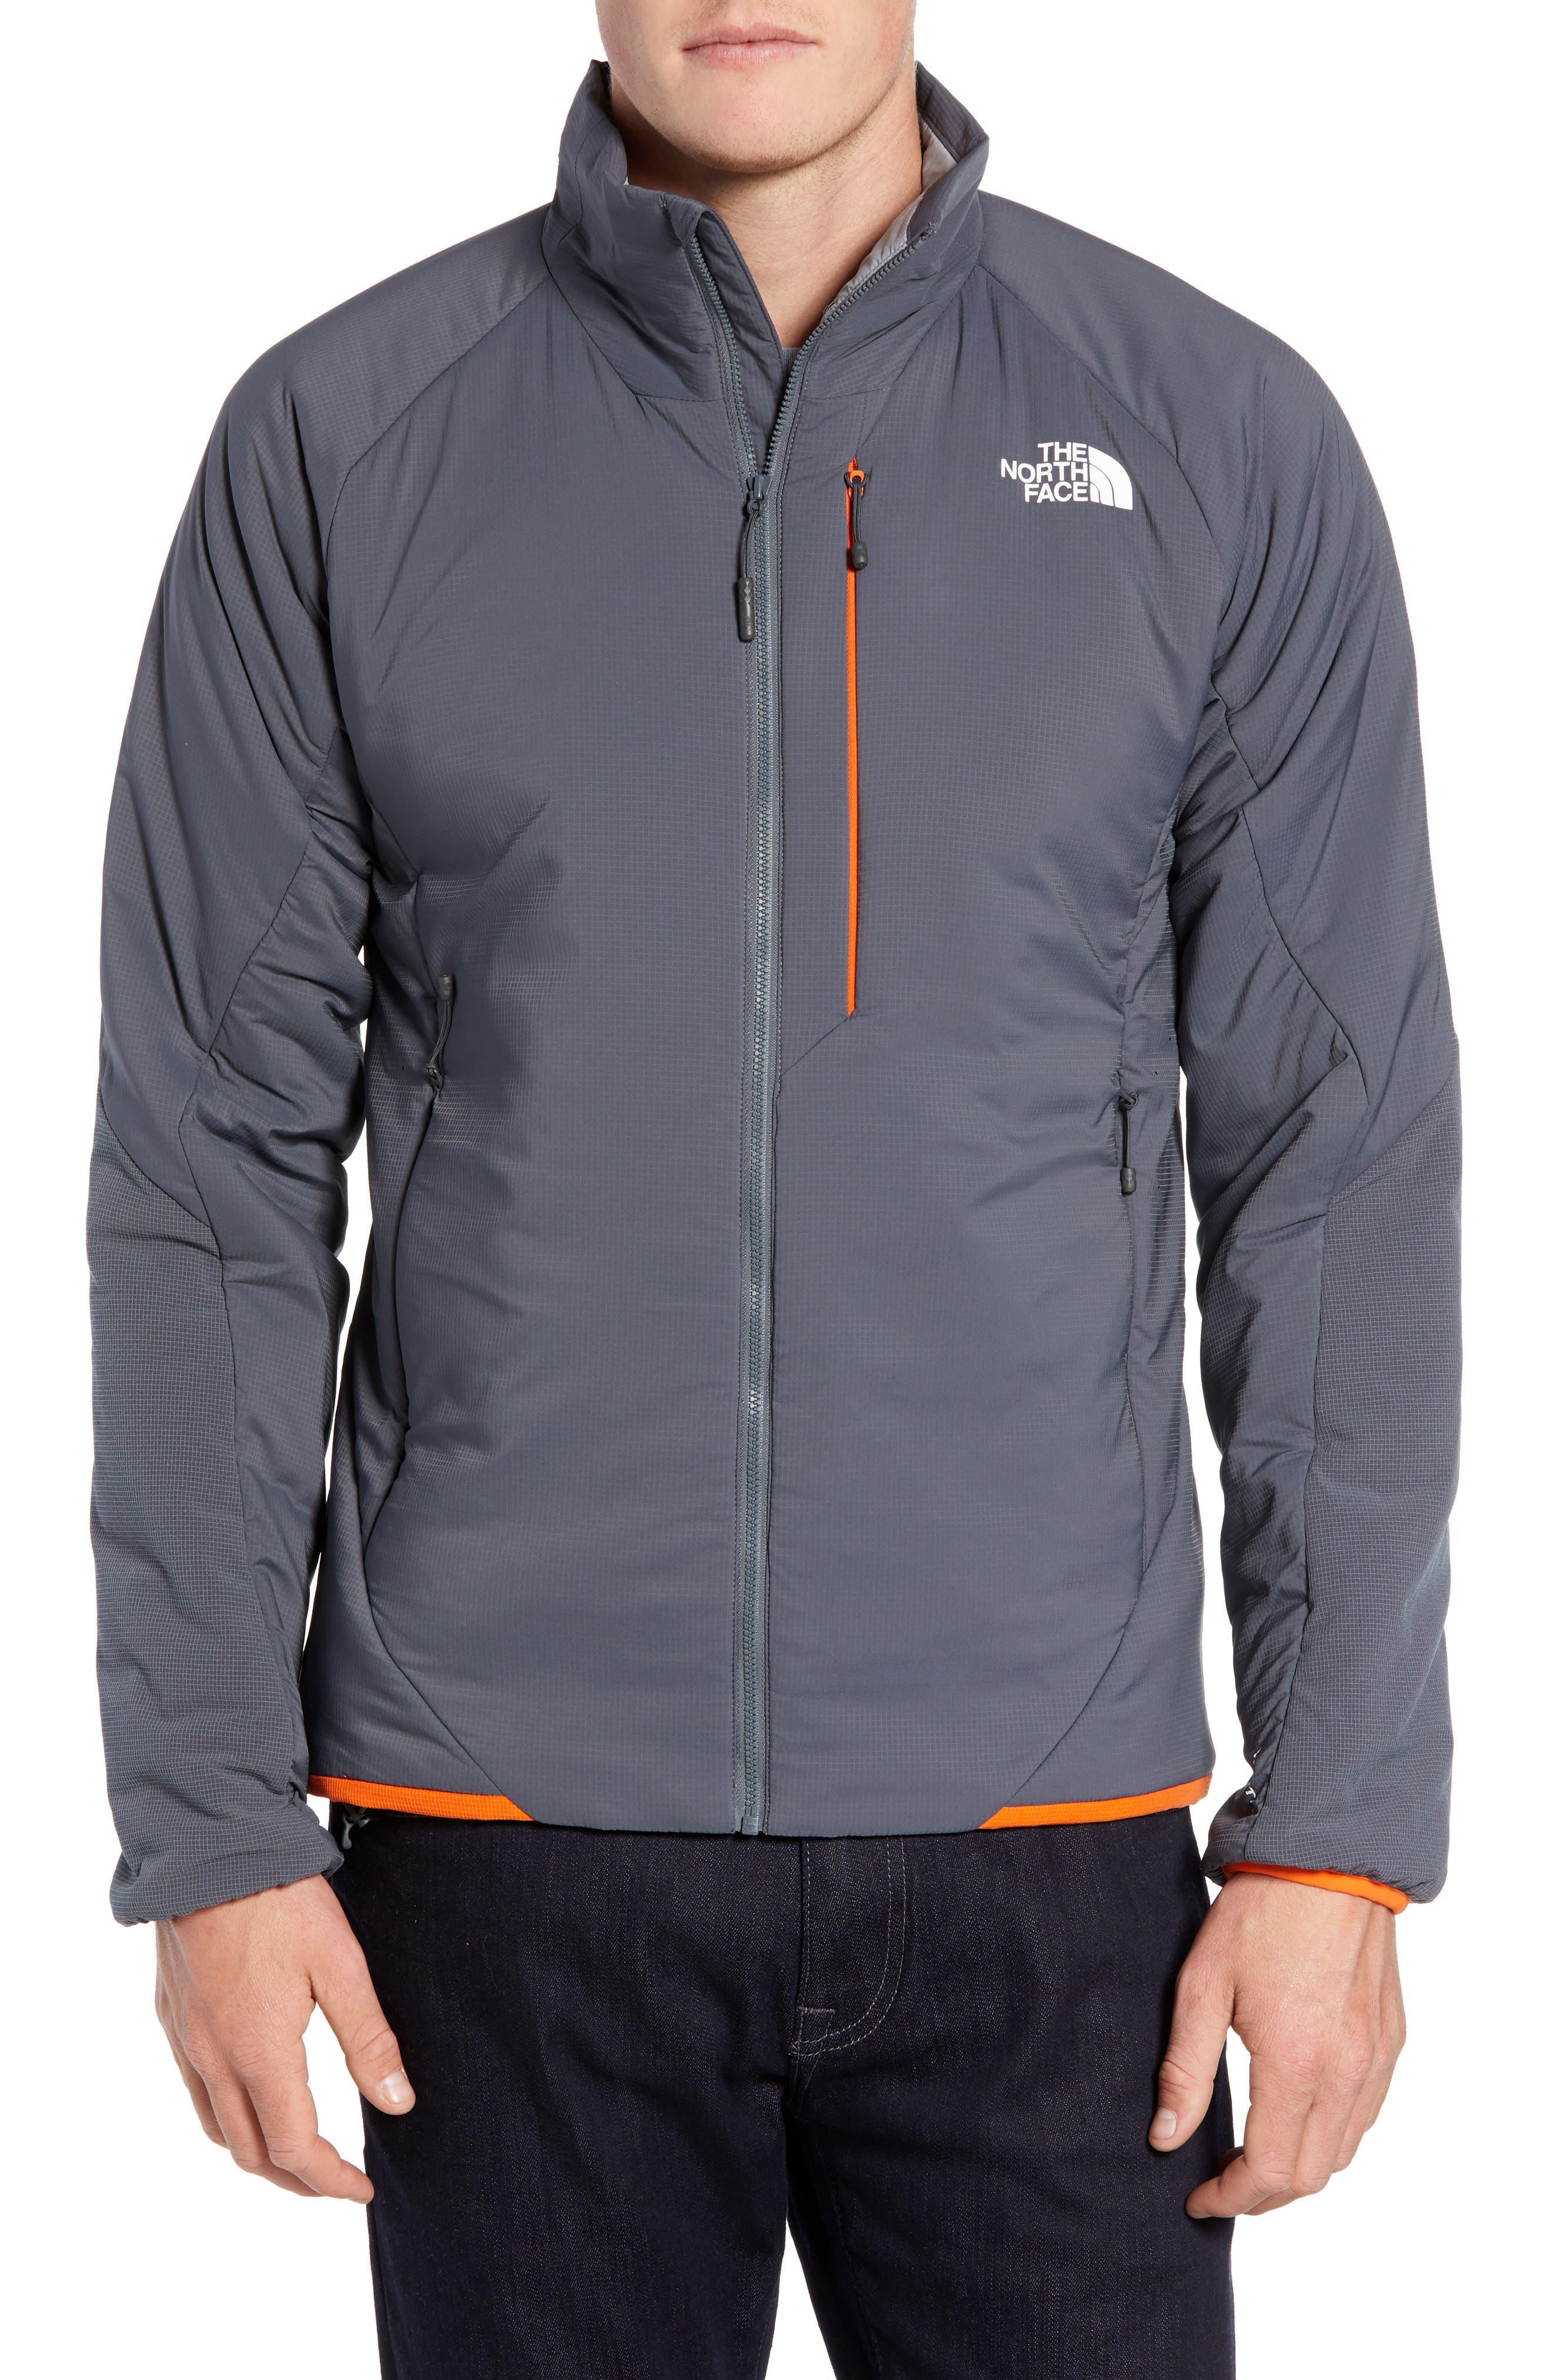 Ventrix Water Resistant Ripstop Jacket,                             Main thumbnail 1, color,                             VANADIS GREY/ VANADIS GREY